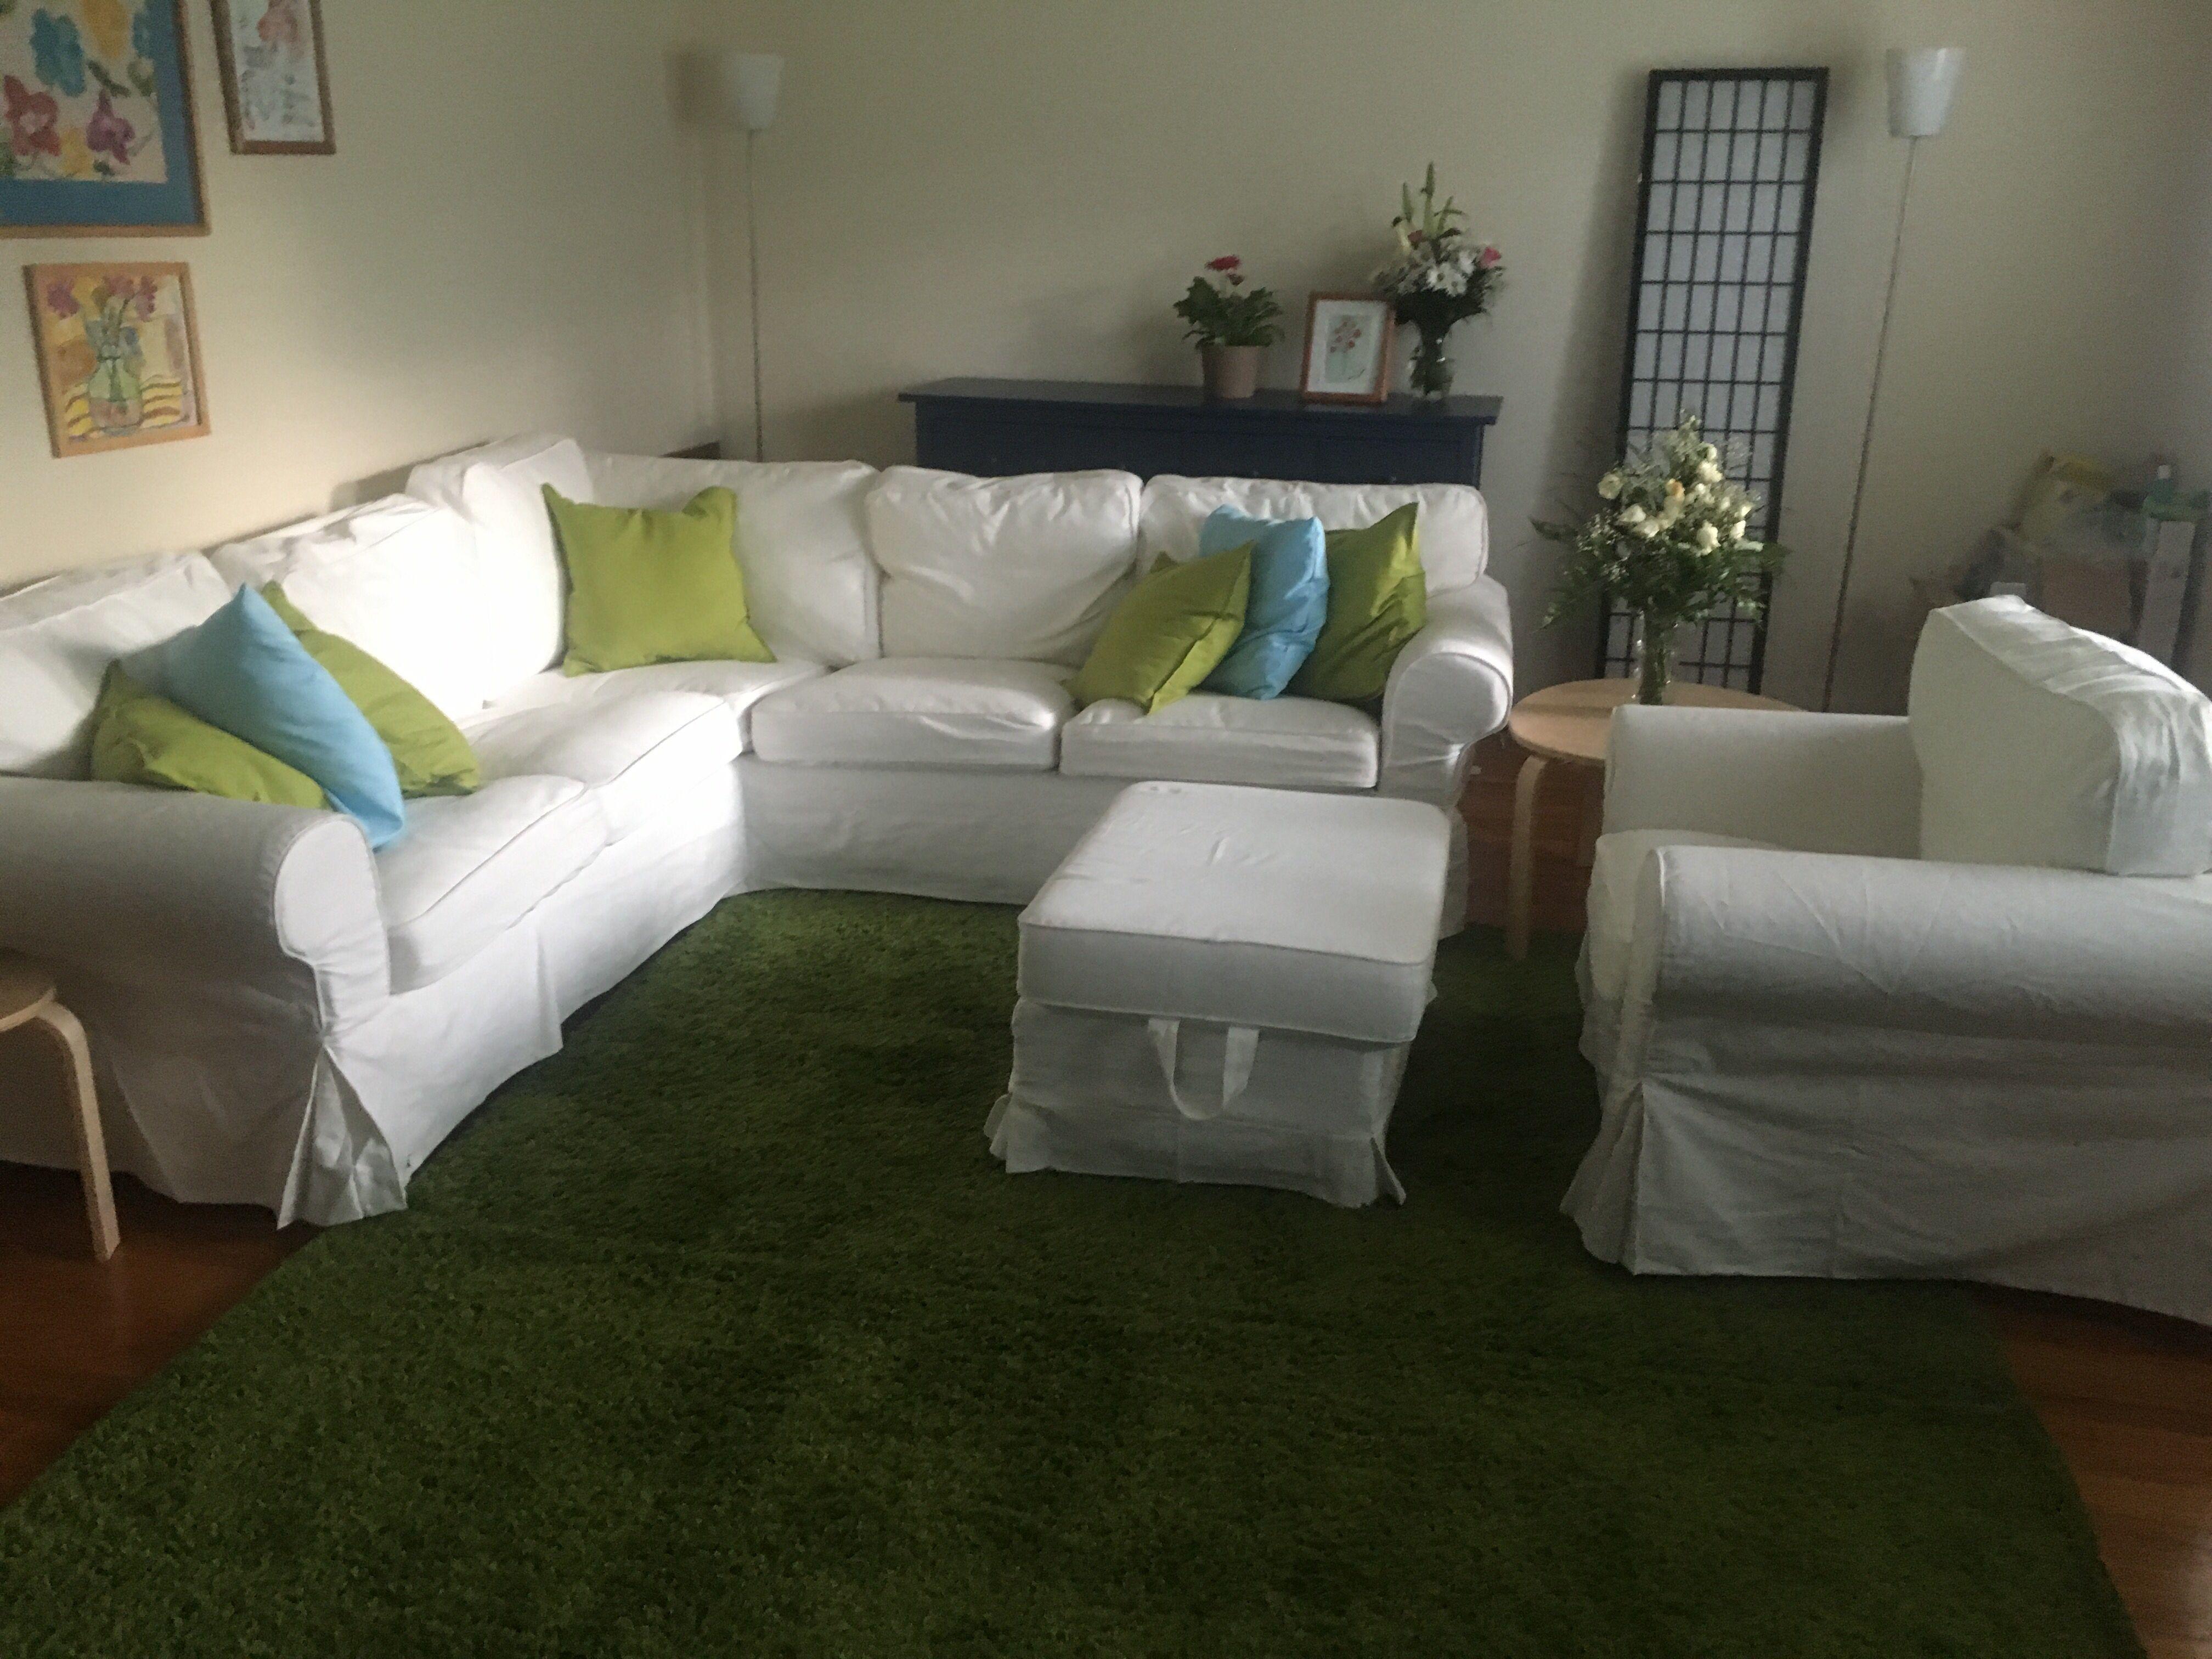 Ikea Ektorp 2 Sofa Green Rugs Blue Hemnes Dresser HemnesGreen RugsLiving Room